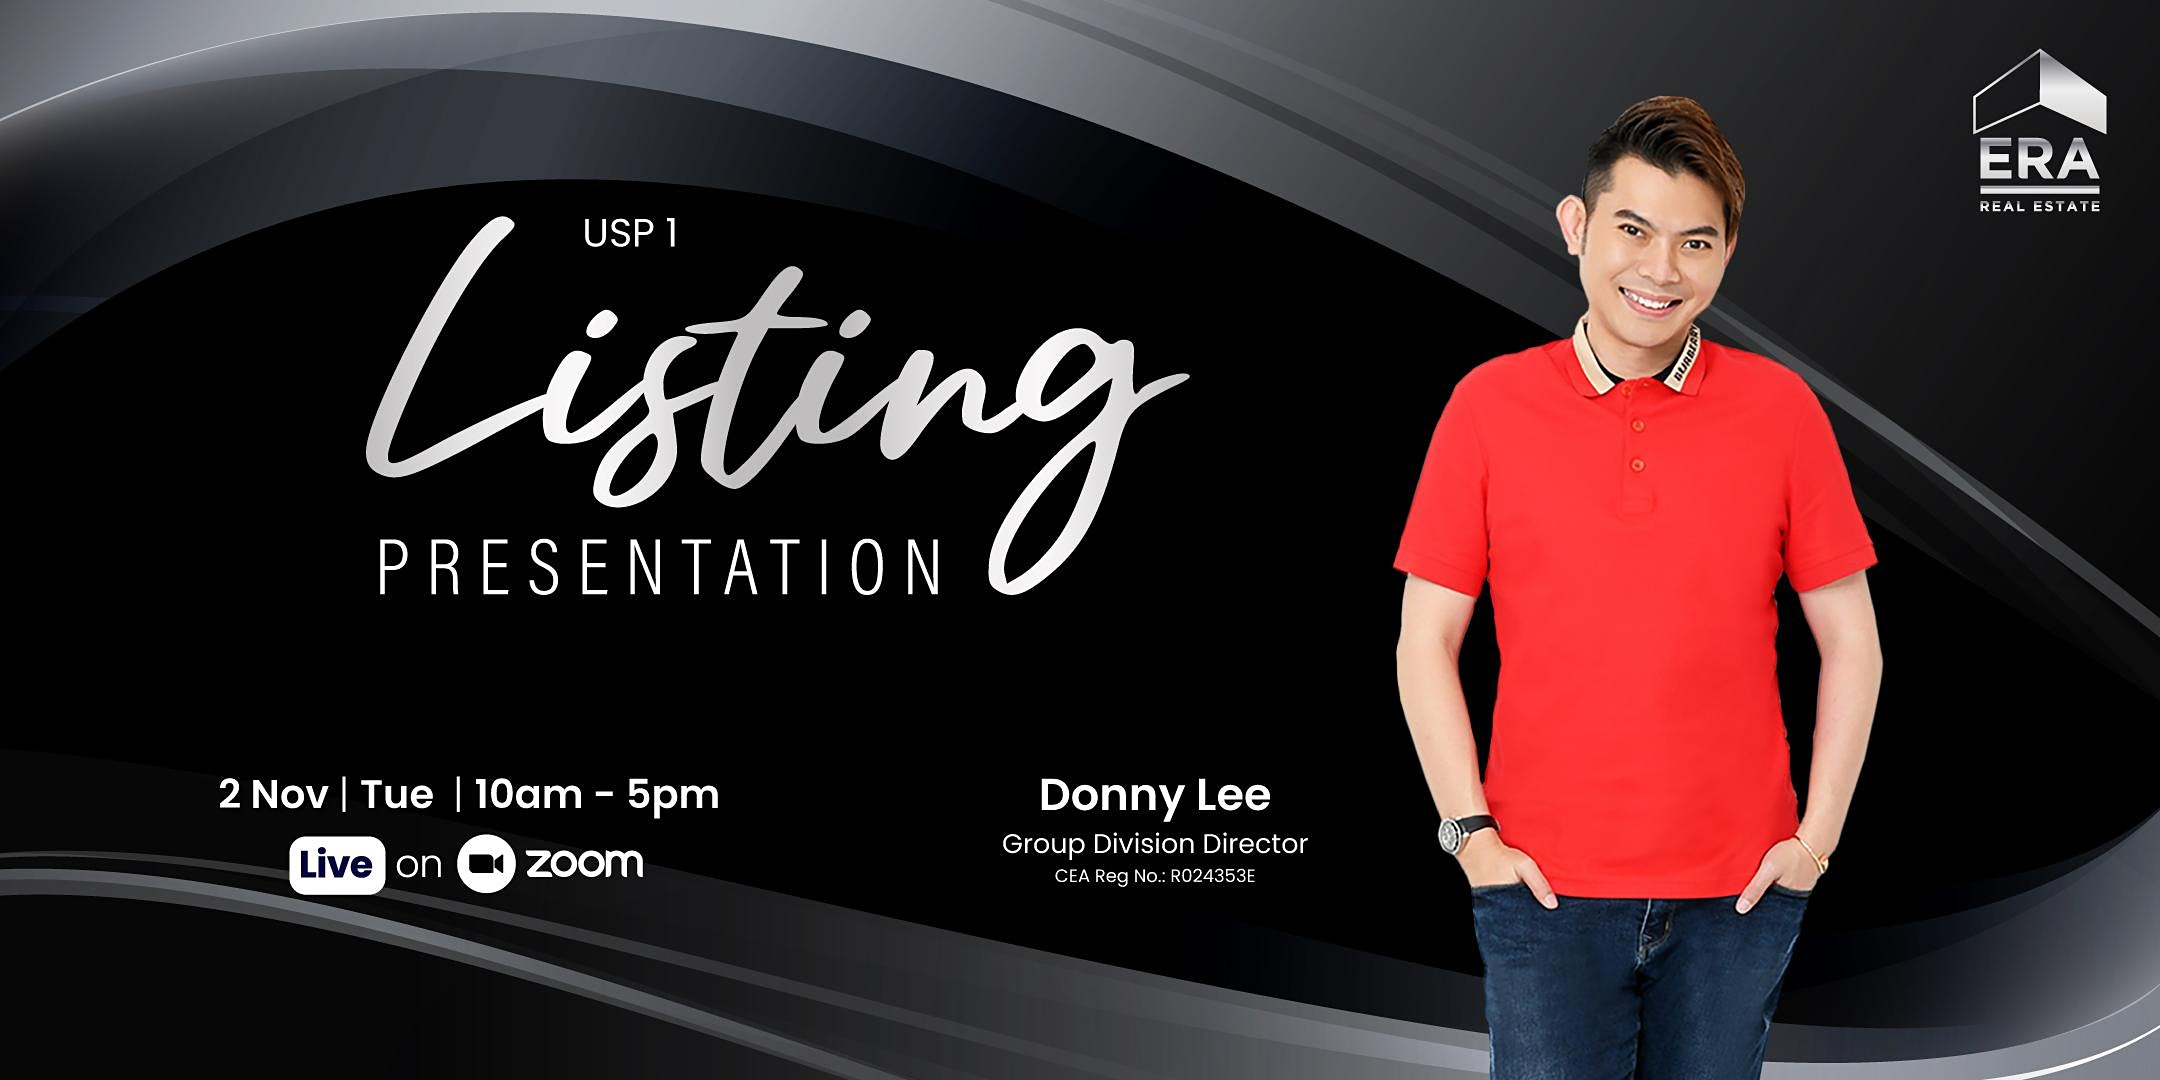 USP 1 : Listing Presentation